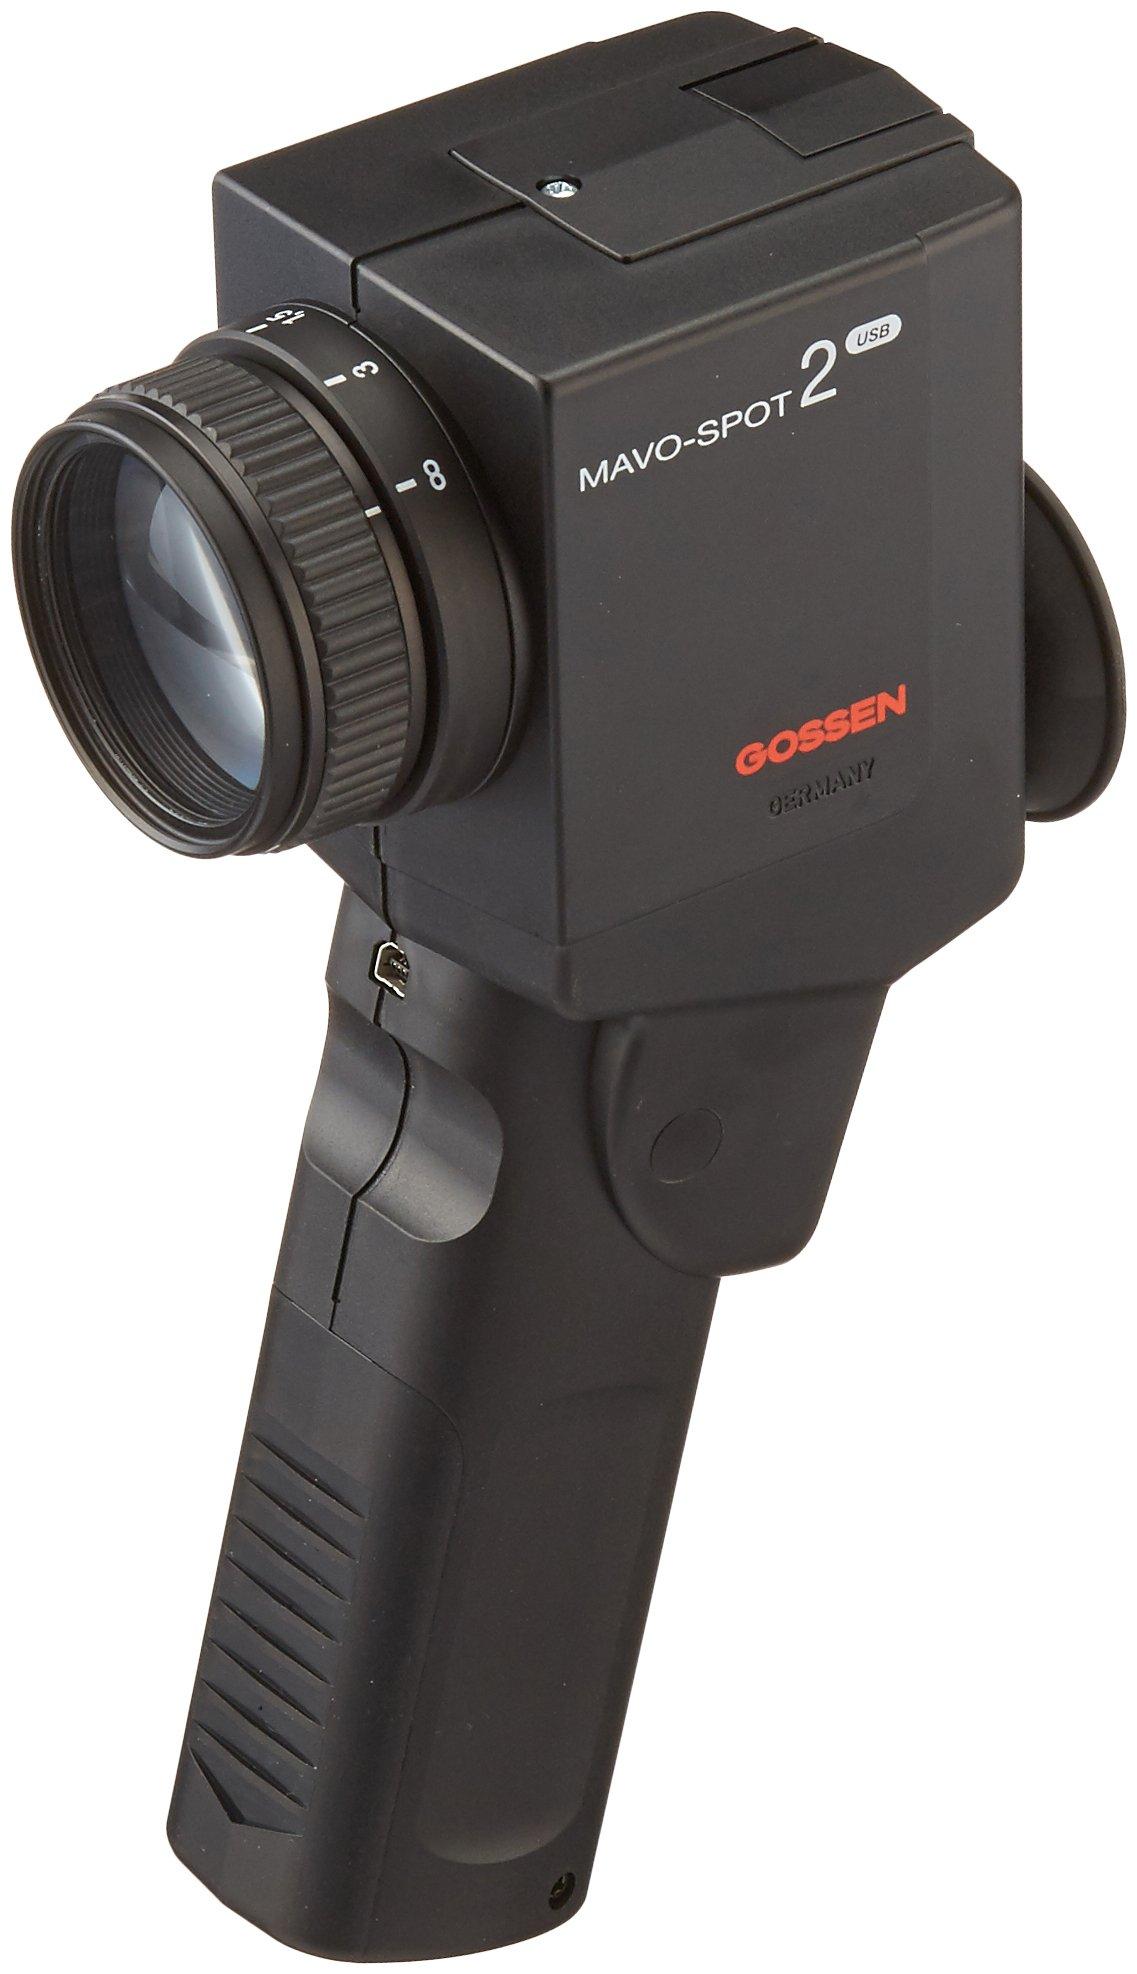 Gossen GO 4200 Mavo-Spot 2 USB 1-Degree Spot Luminance Meter (Black)